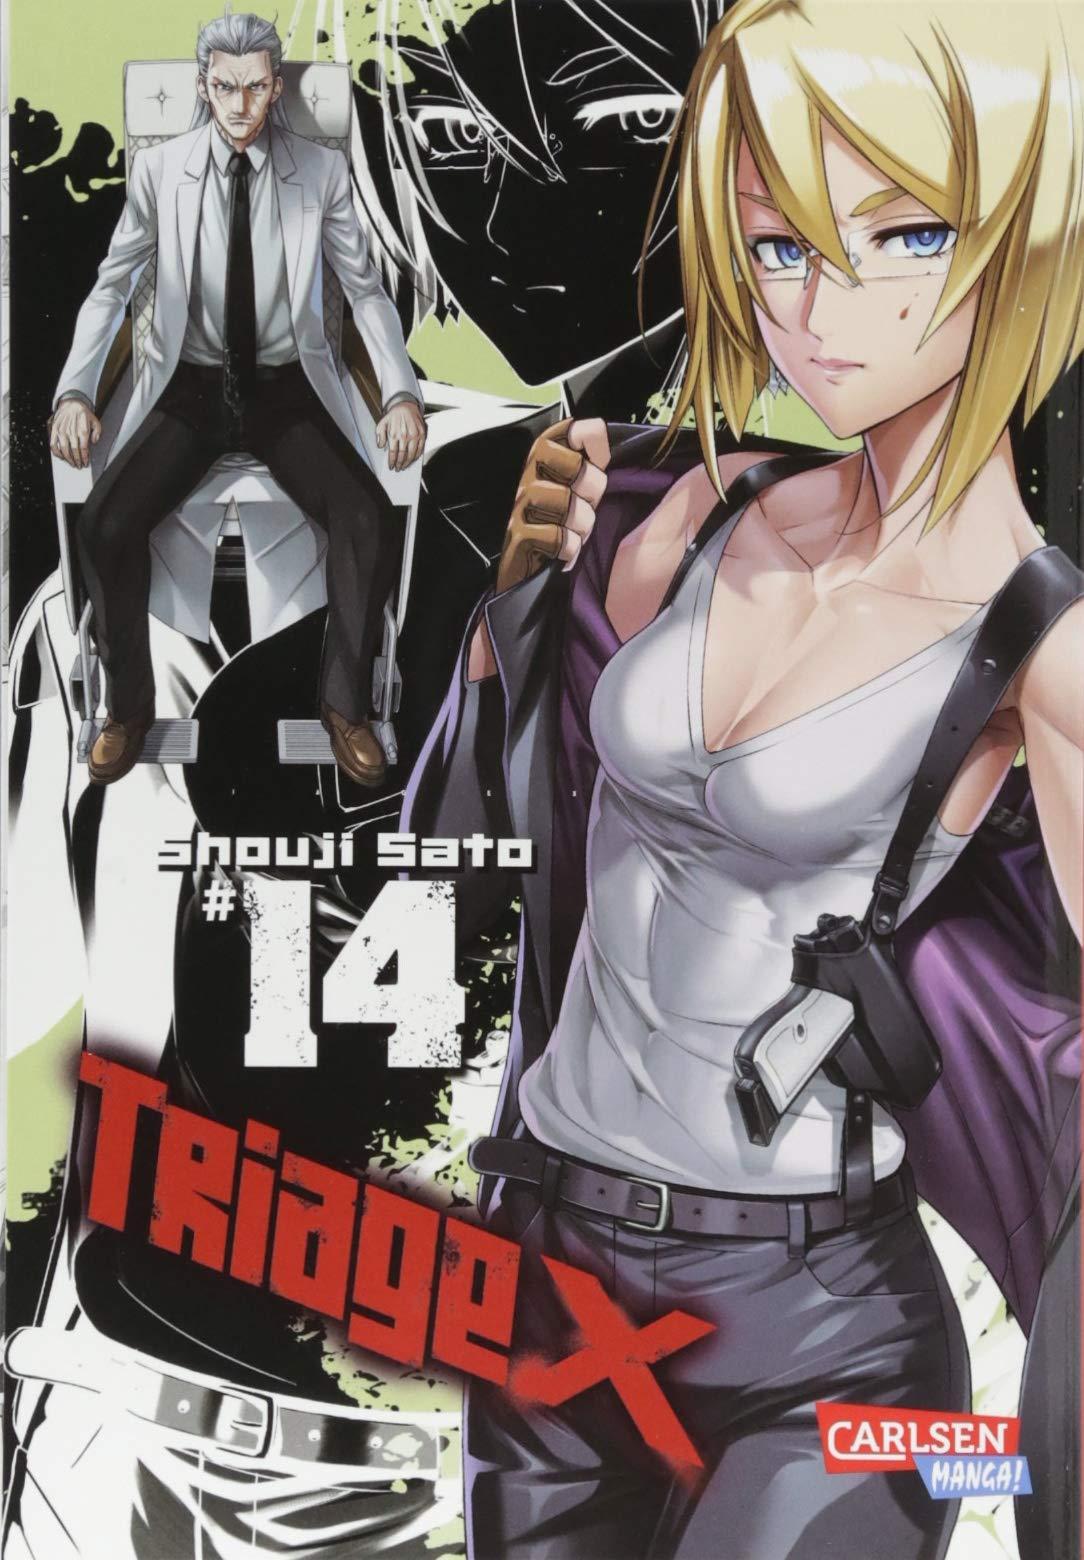 Triage X 14 Taschenbuch – 28. November 2017 Shouji Sato Hiro Yamada Carlsen 3551746842